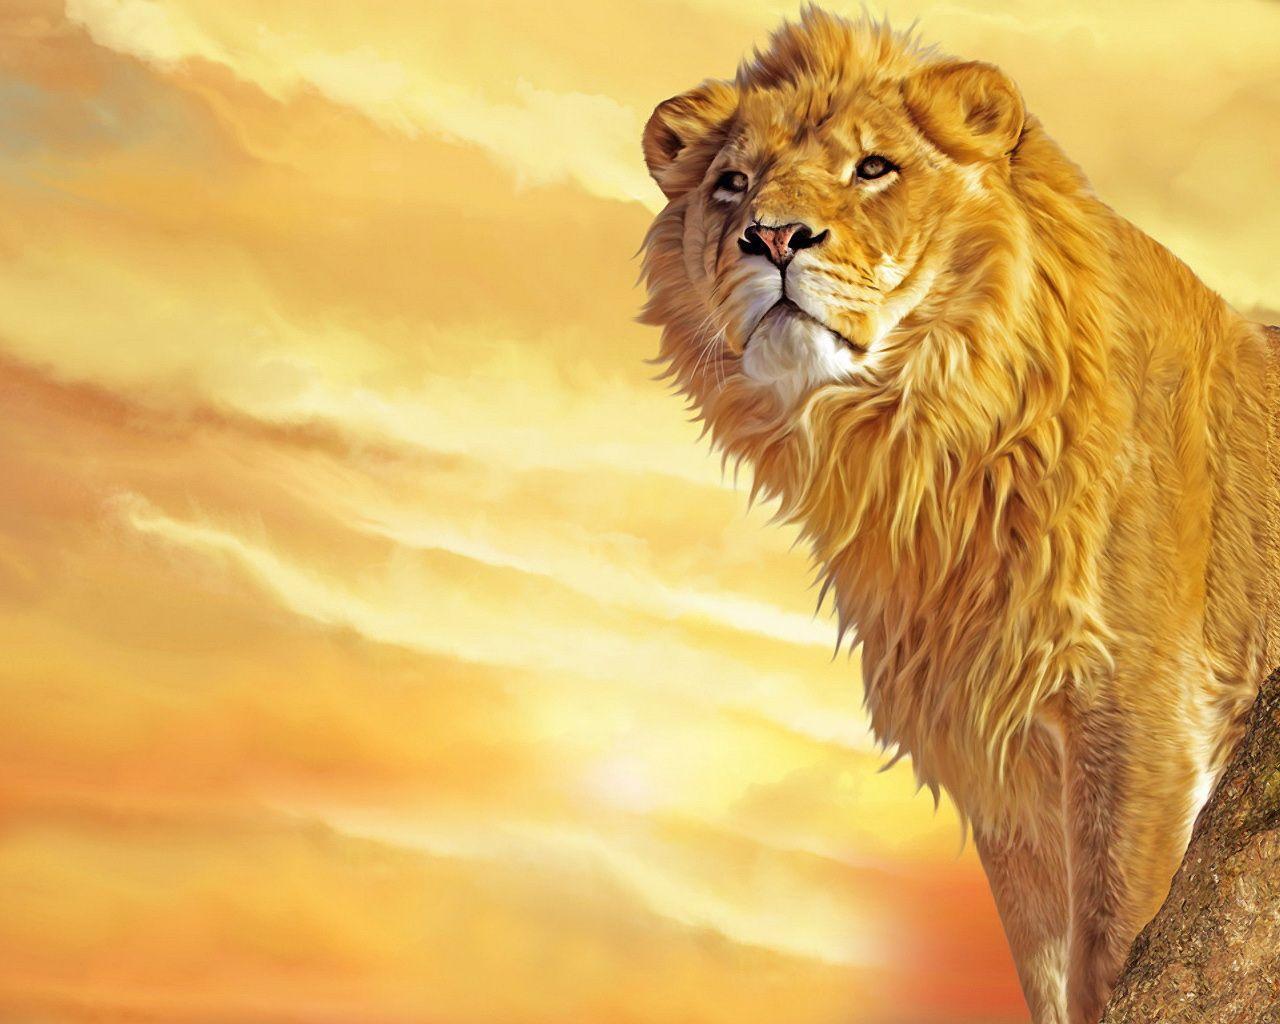 HD Lion Wallpaper - WallpaperSafari